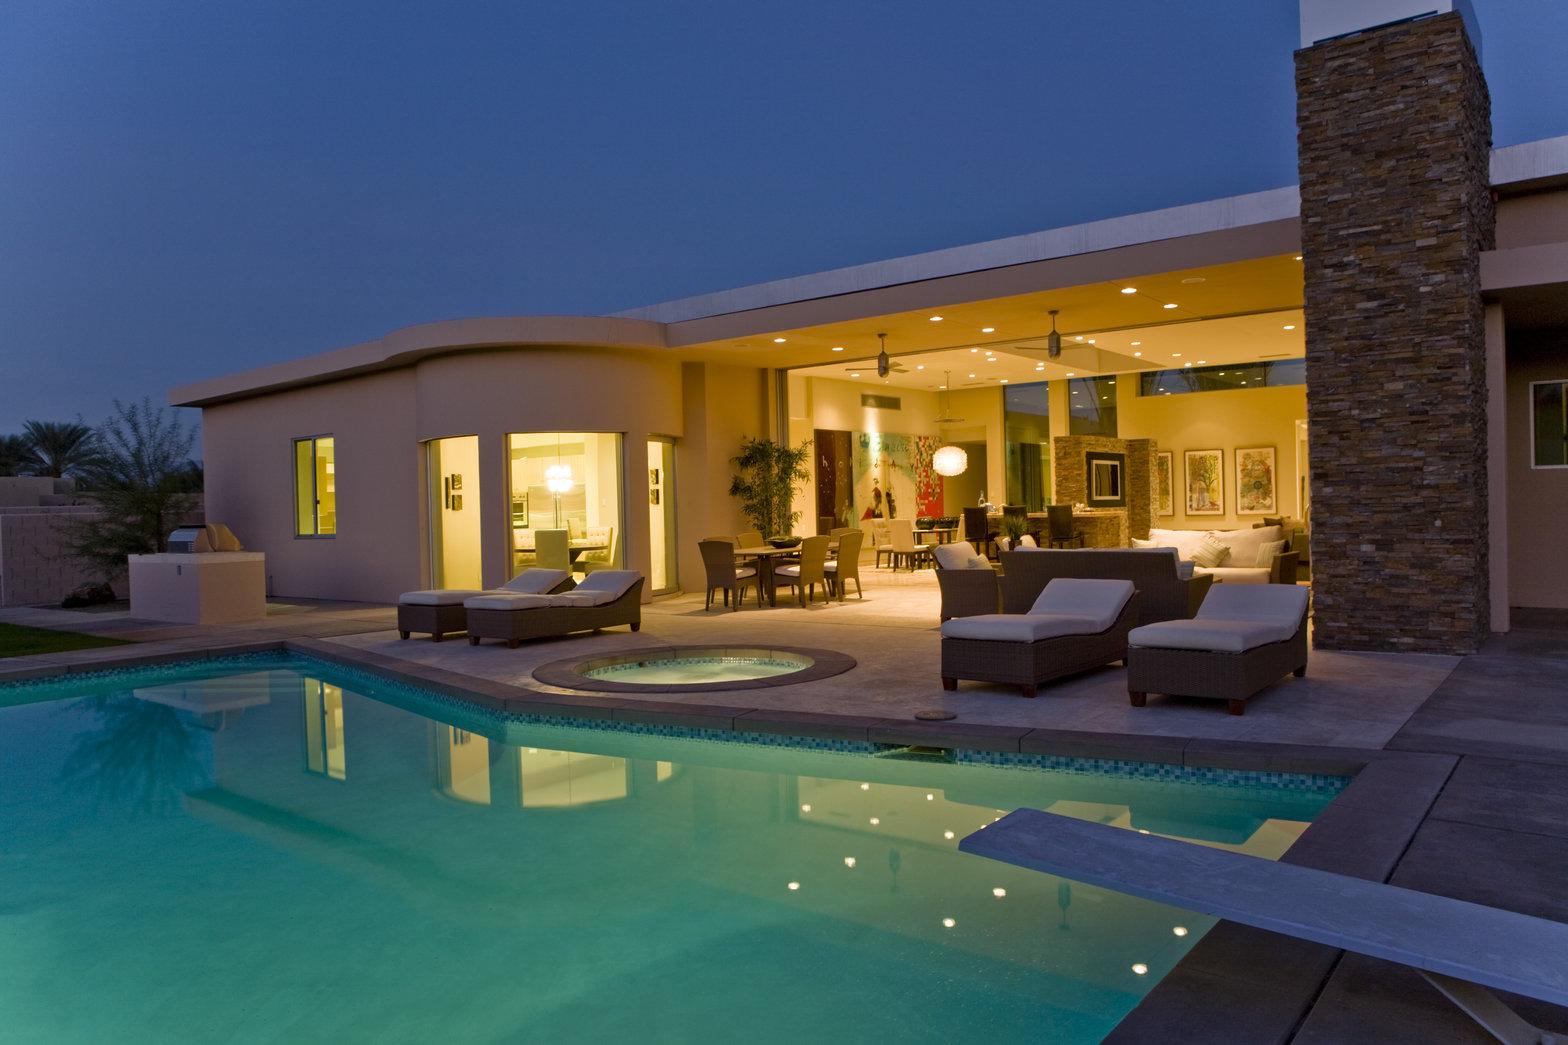 pools saltwater vs chlorine your project loan. Black Bedroom Furniture Sets. Home Design Ideas